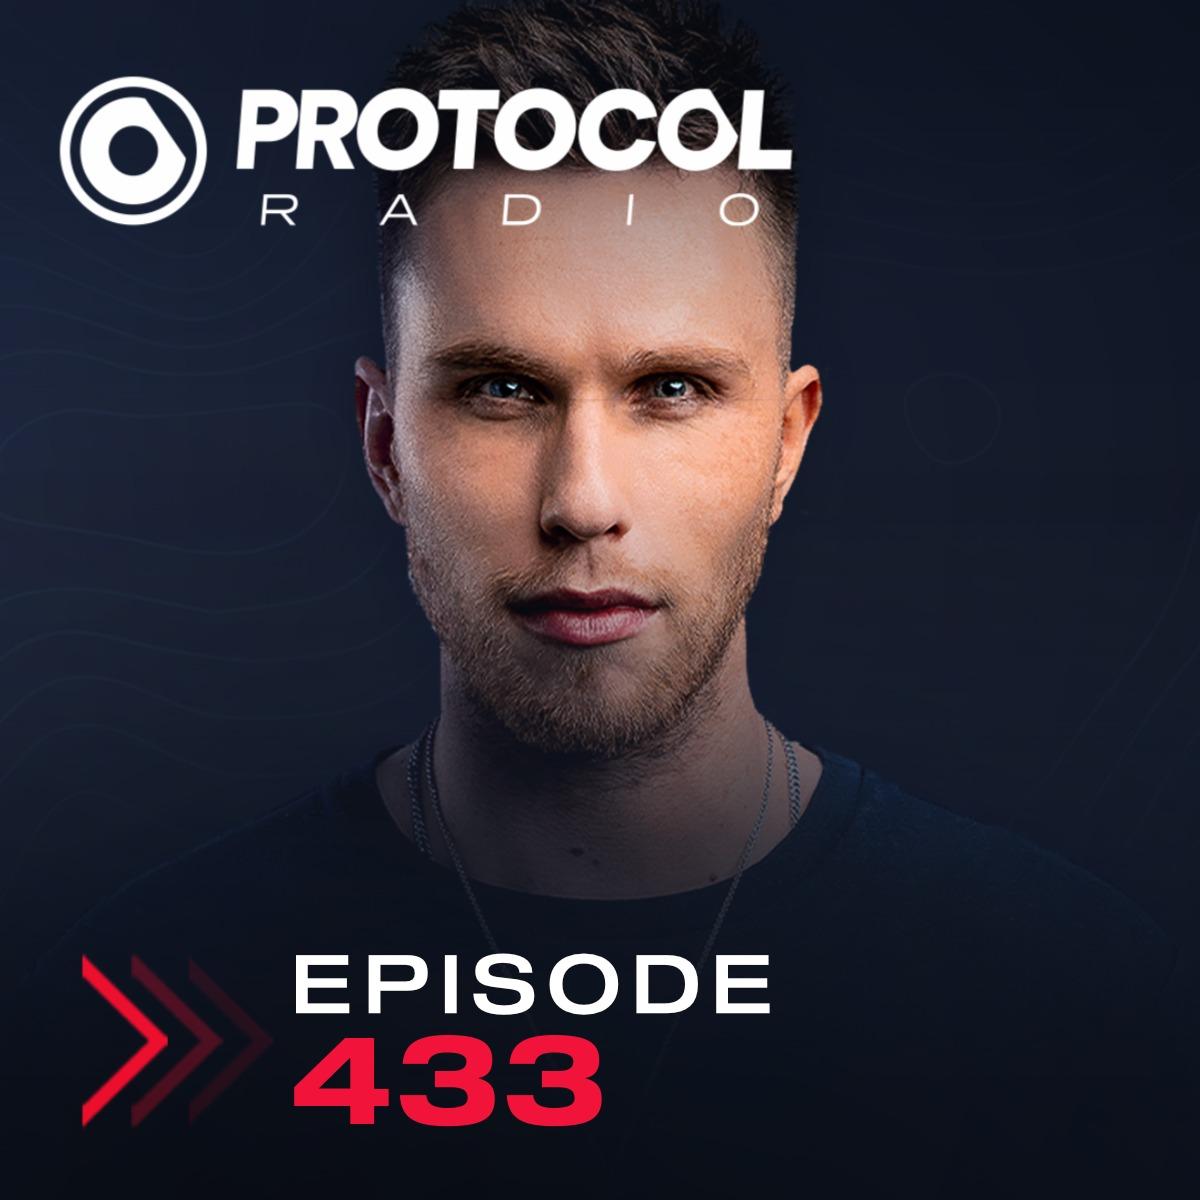 Nicky Romero presents: Protocol Radio Protocol Radio #433